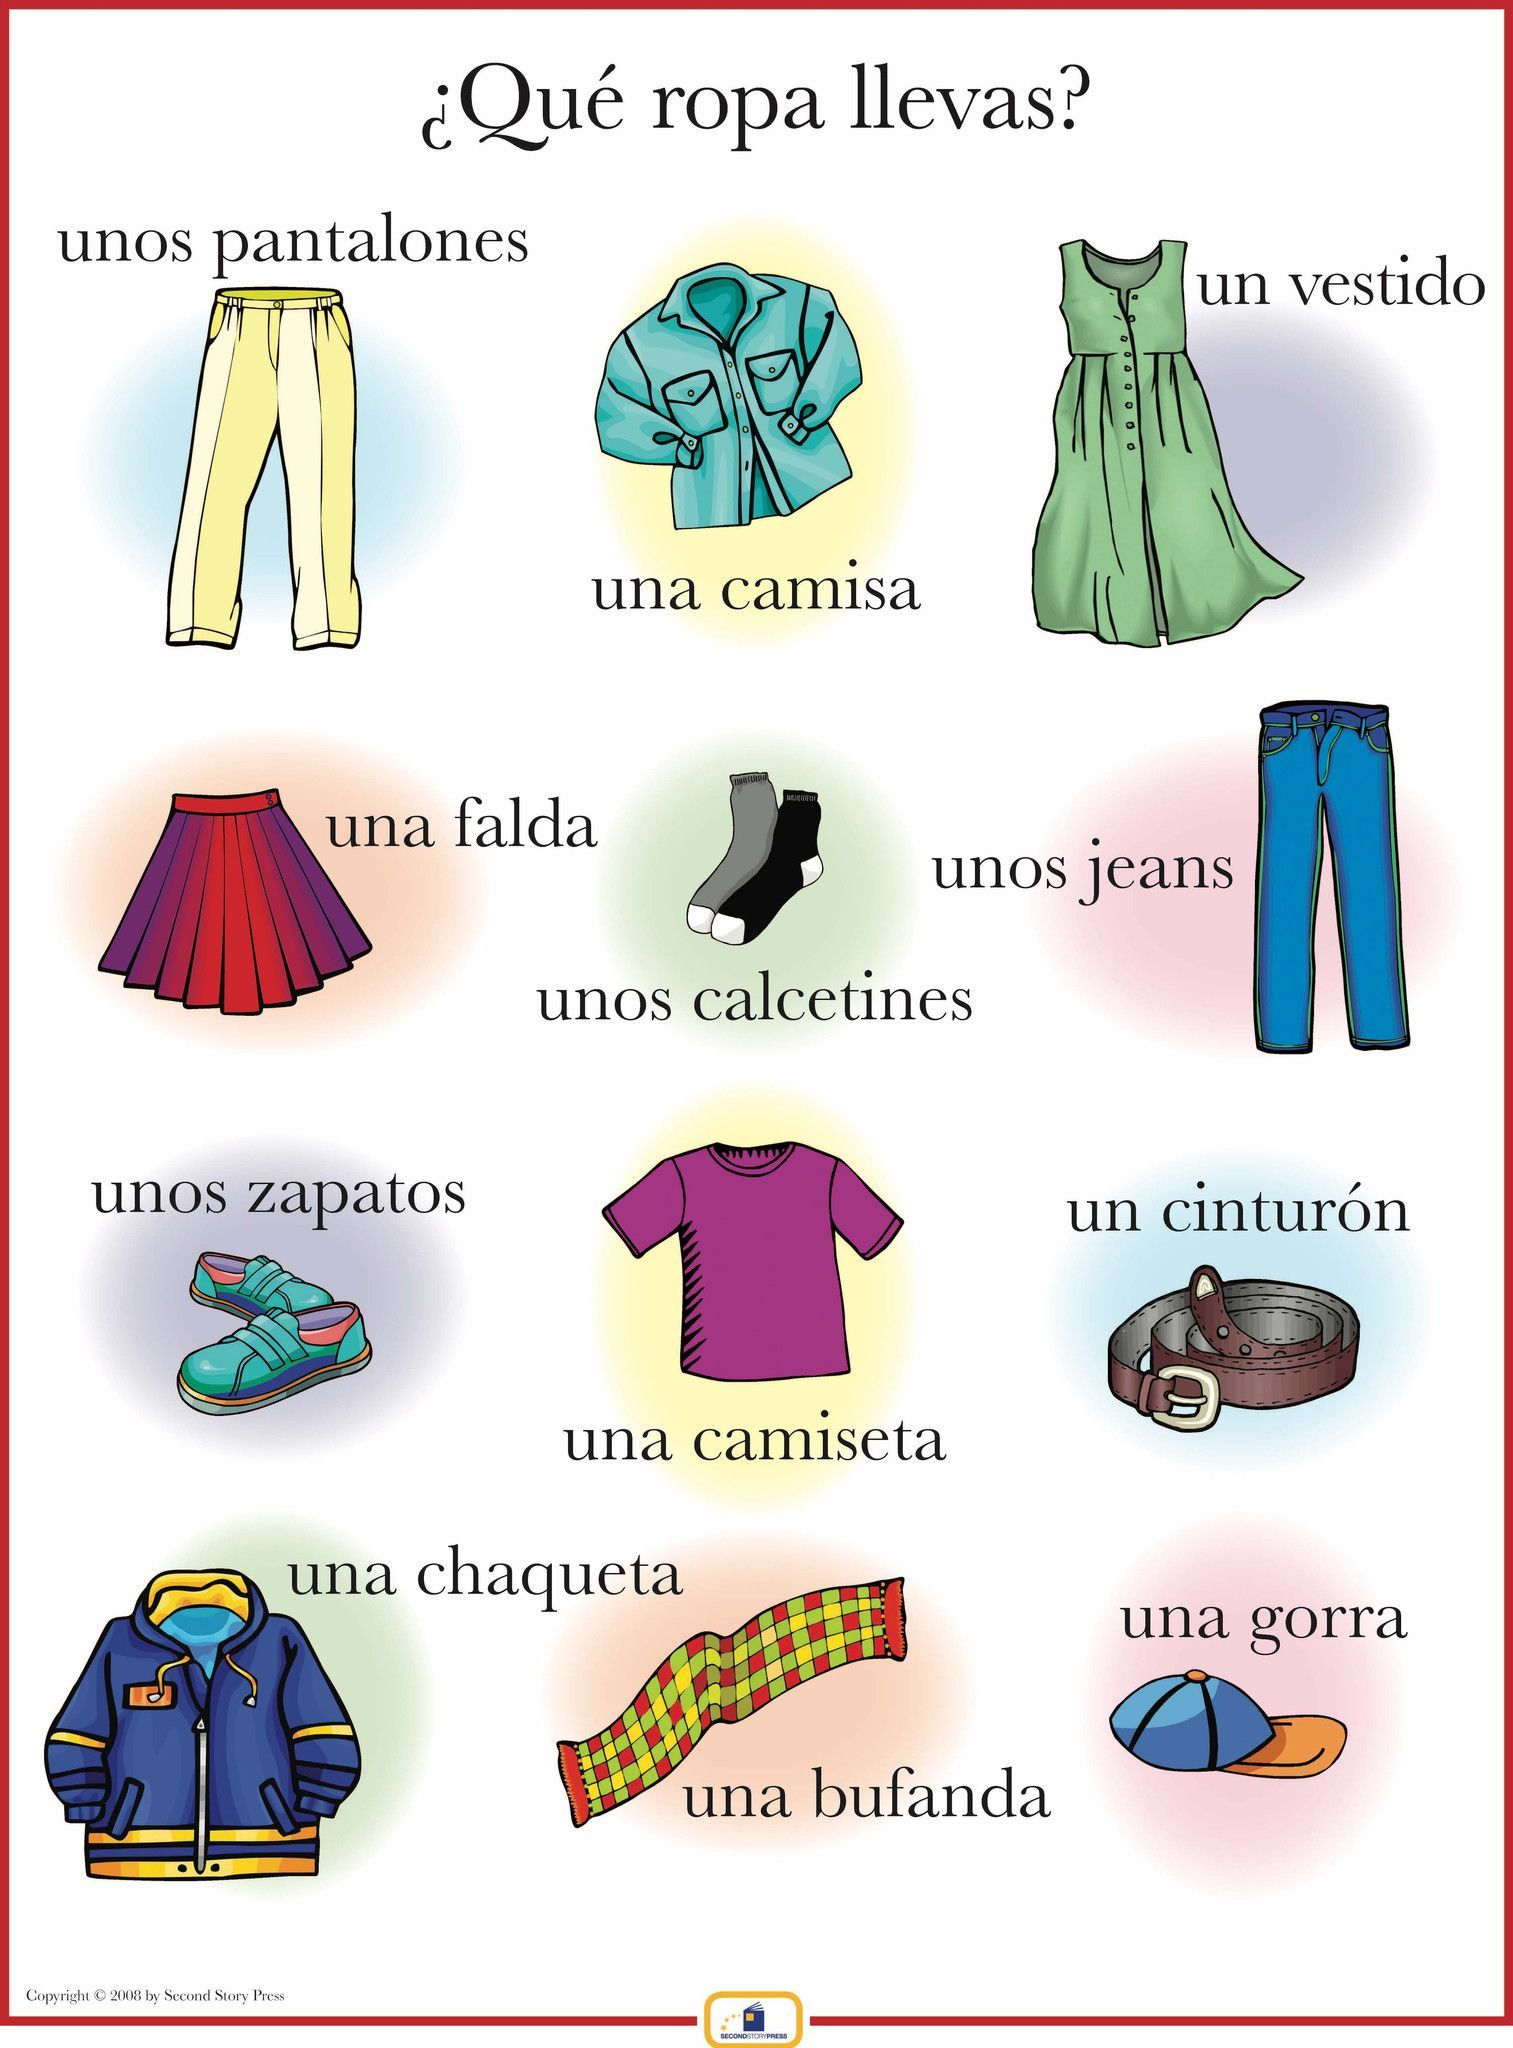 spanish clothing poster cap tulo 5 spanish language. Black Bedroom Furniture Sets. Home Design Ideas